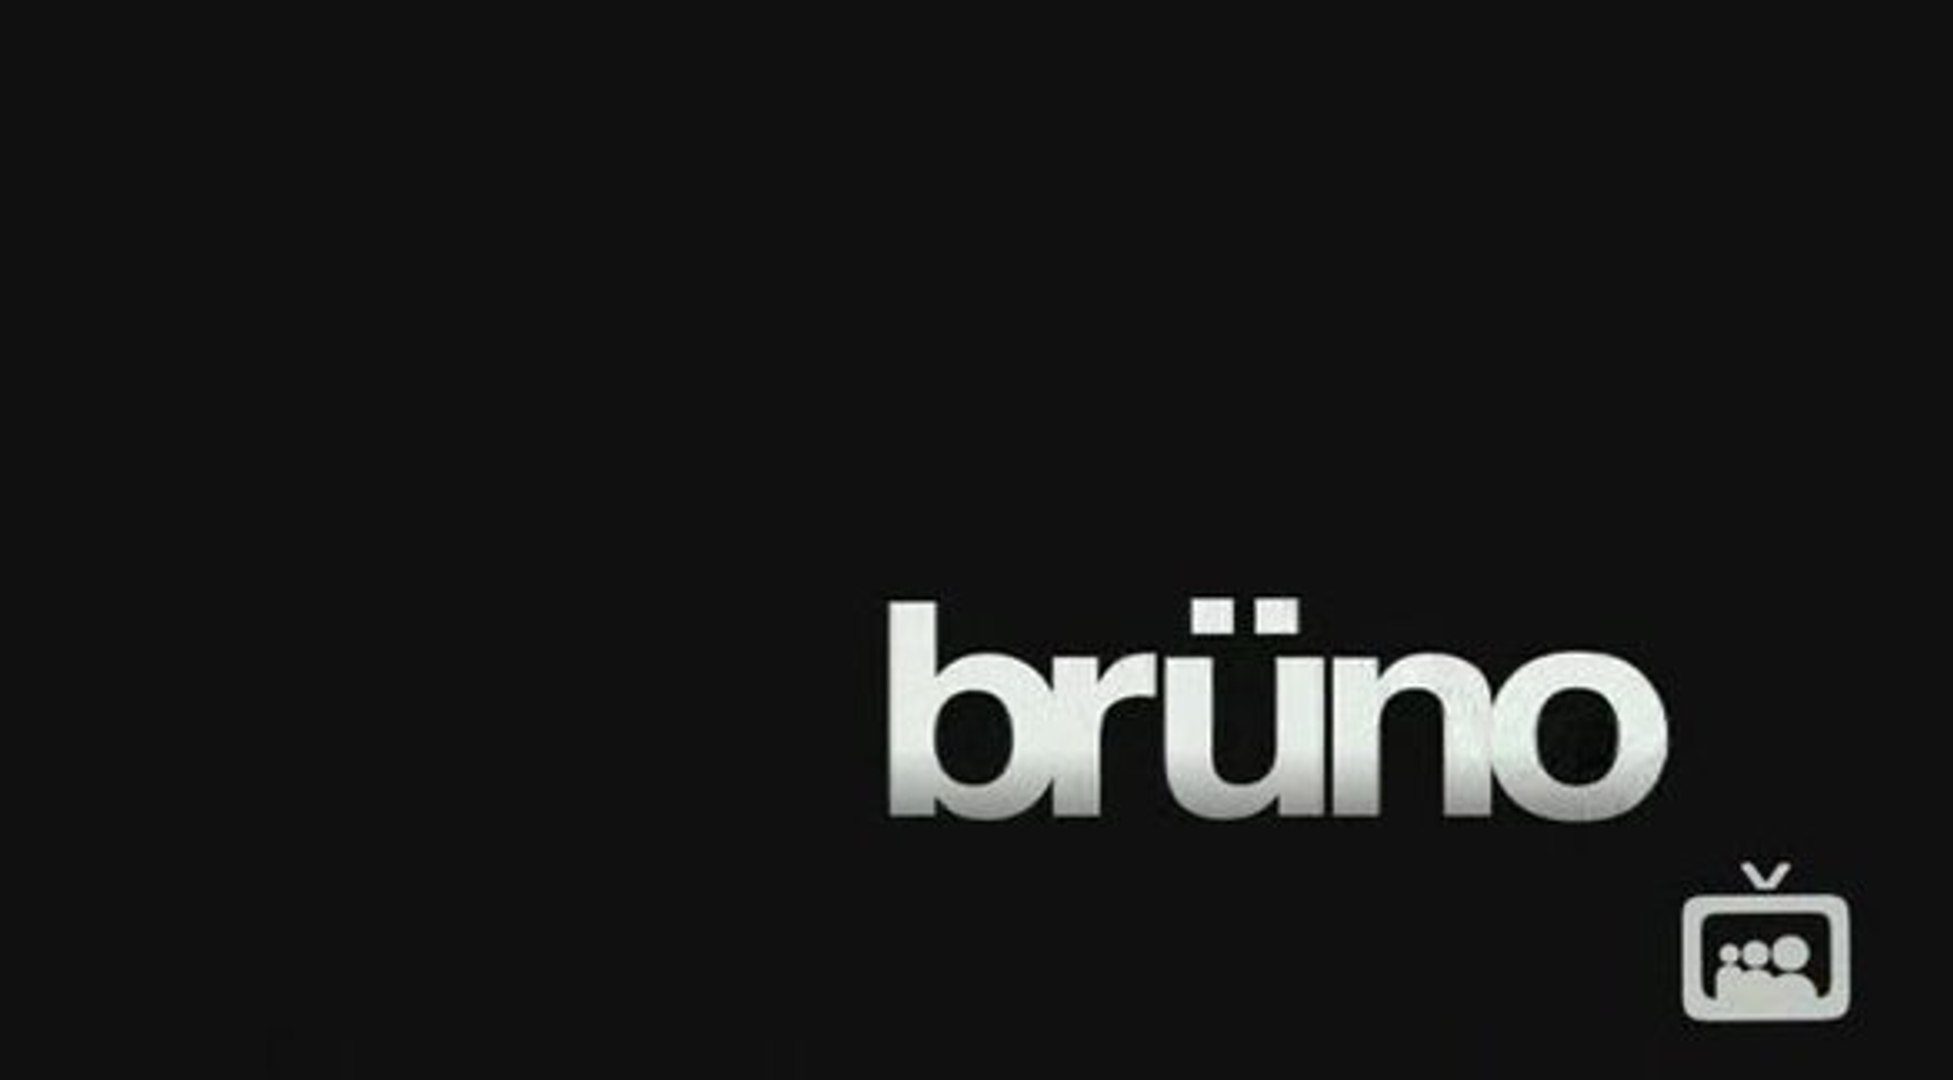 Bande Annonce Bruno red band trailer Sacha Baron Cohen borat